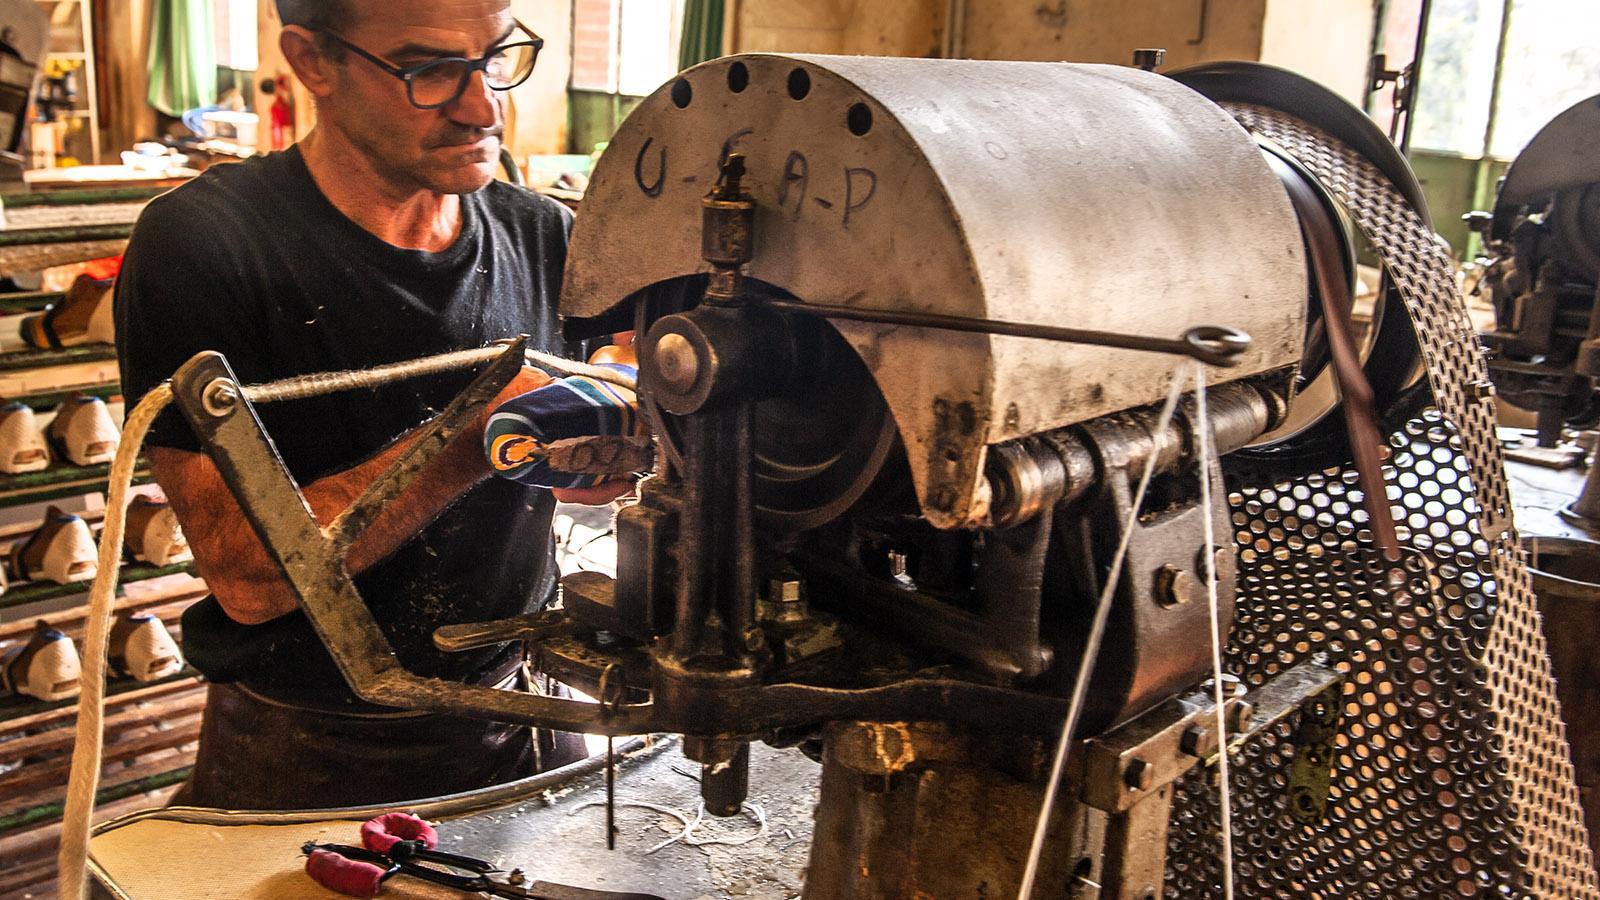 Katalanen-Handwerk bei Création Catalane. Foto: Hilke Maunder